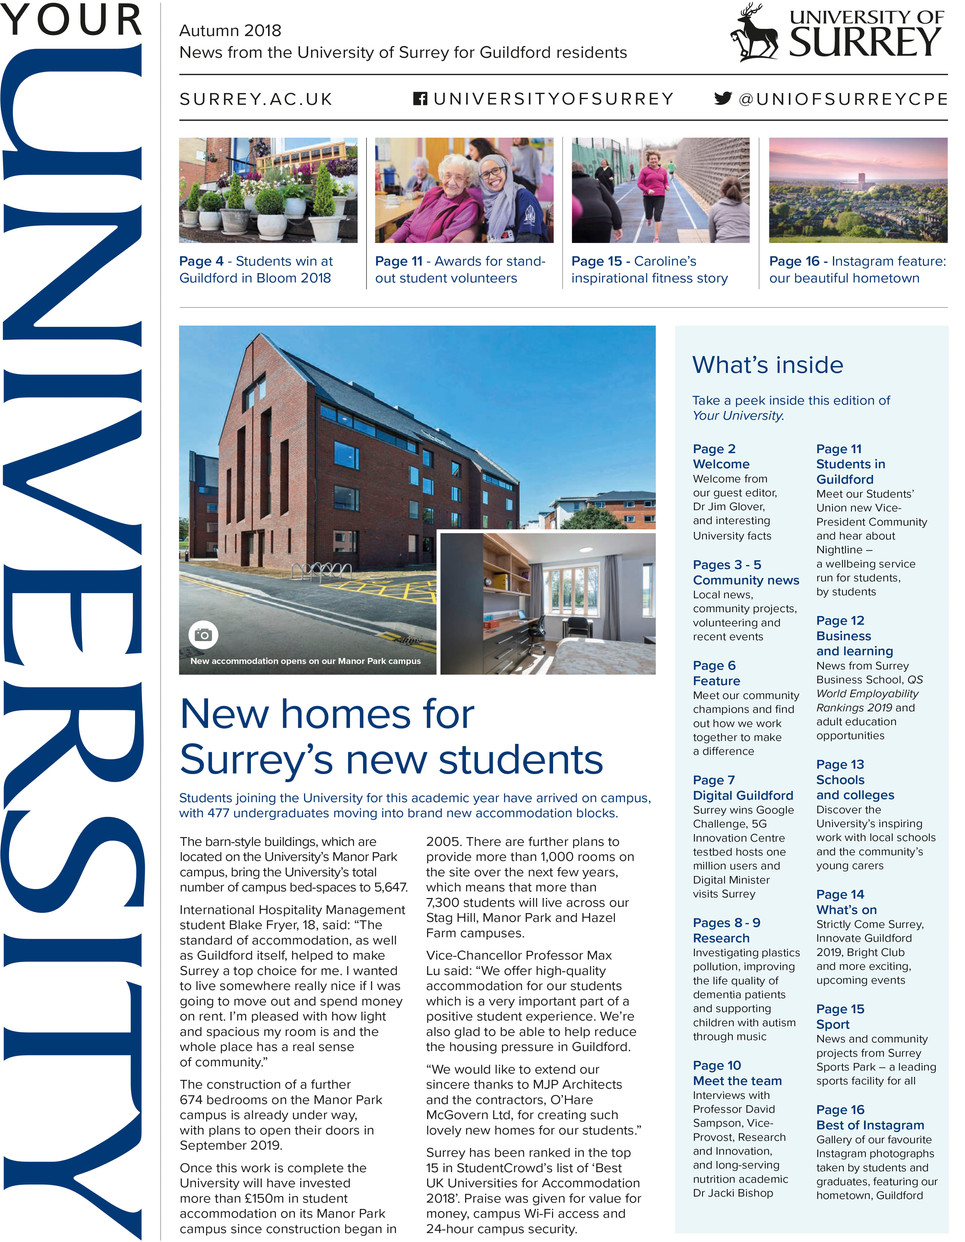 8581-0818 Your university newspaper_Autu